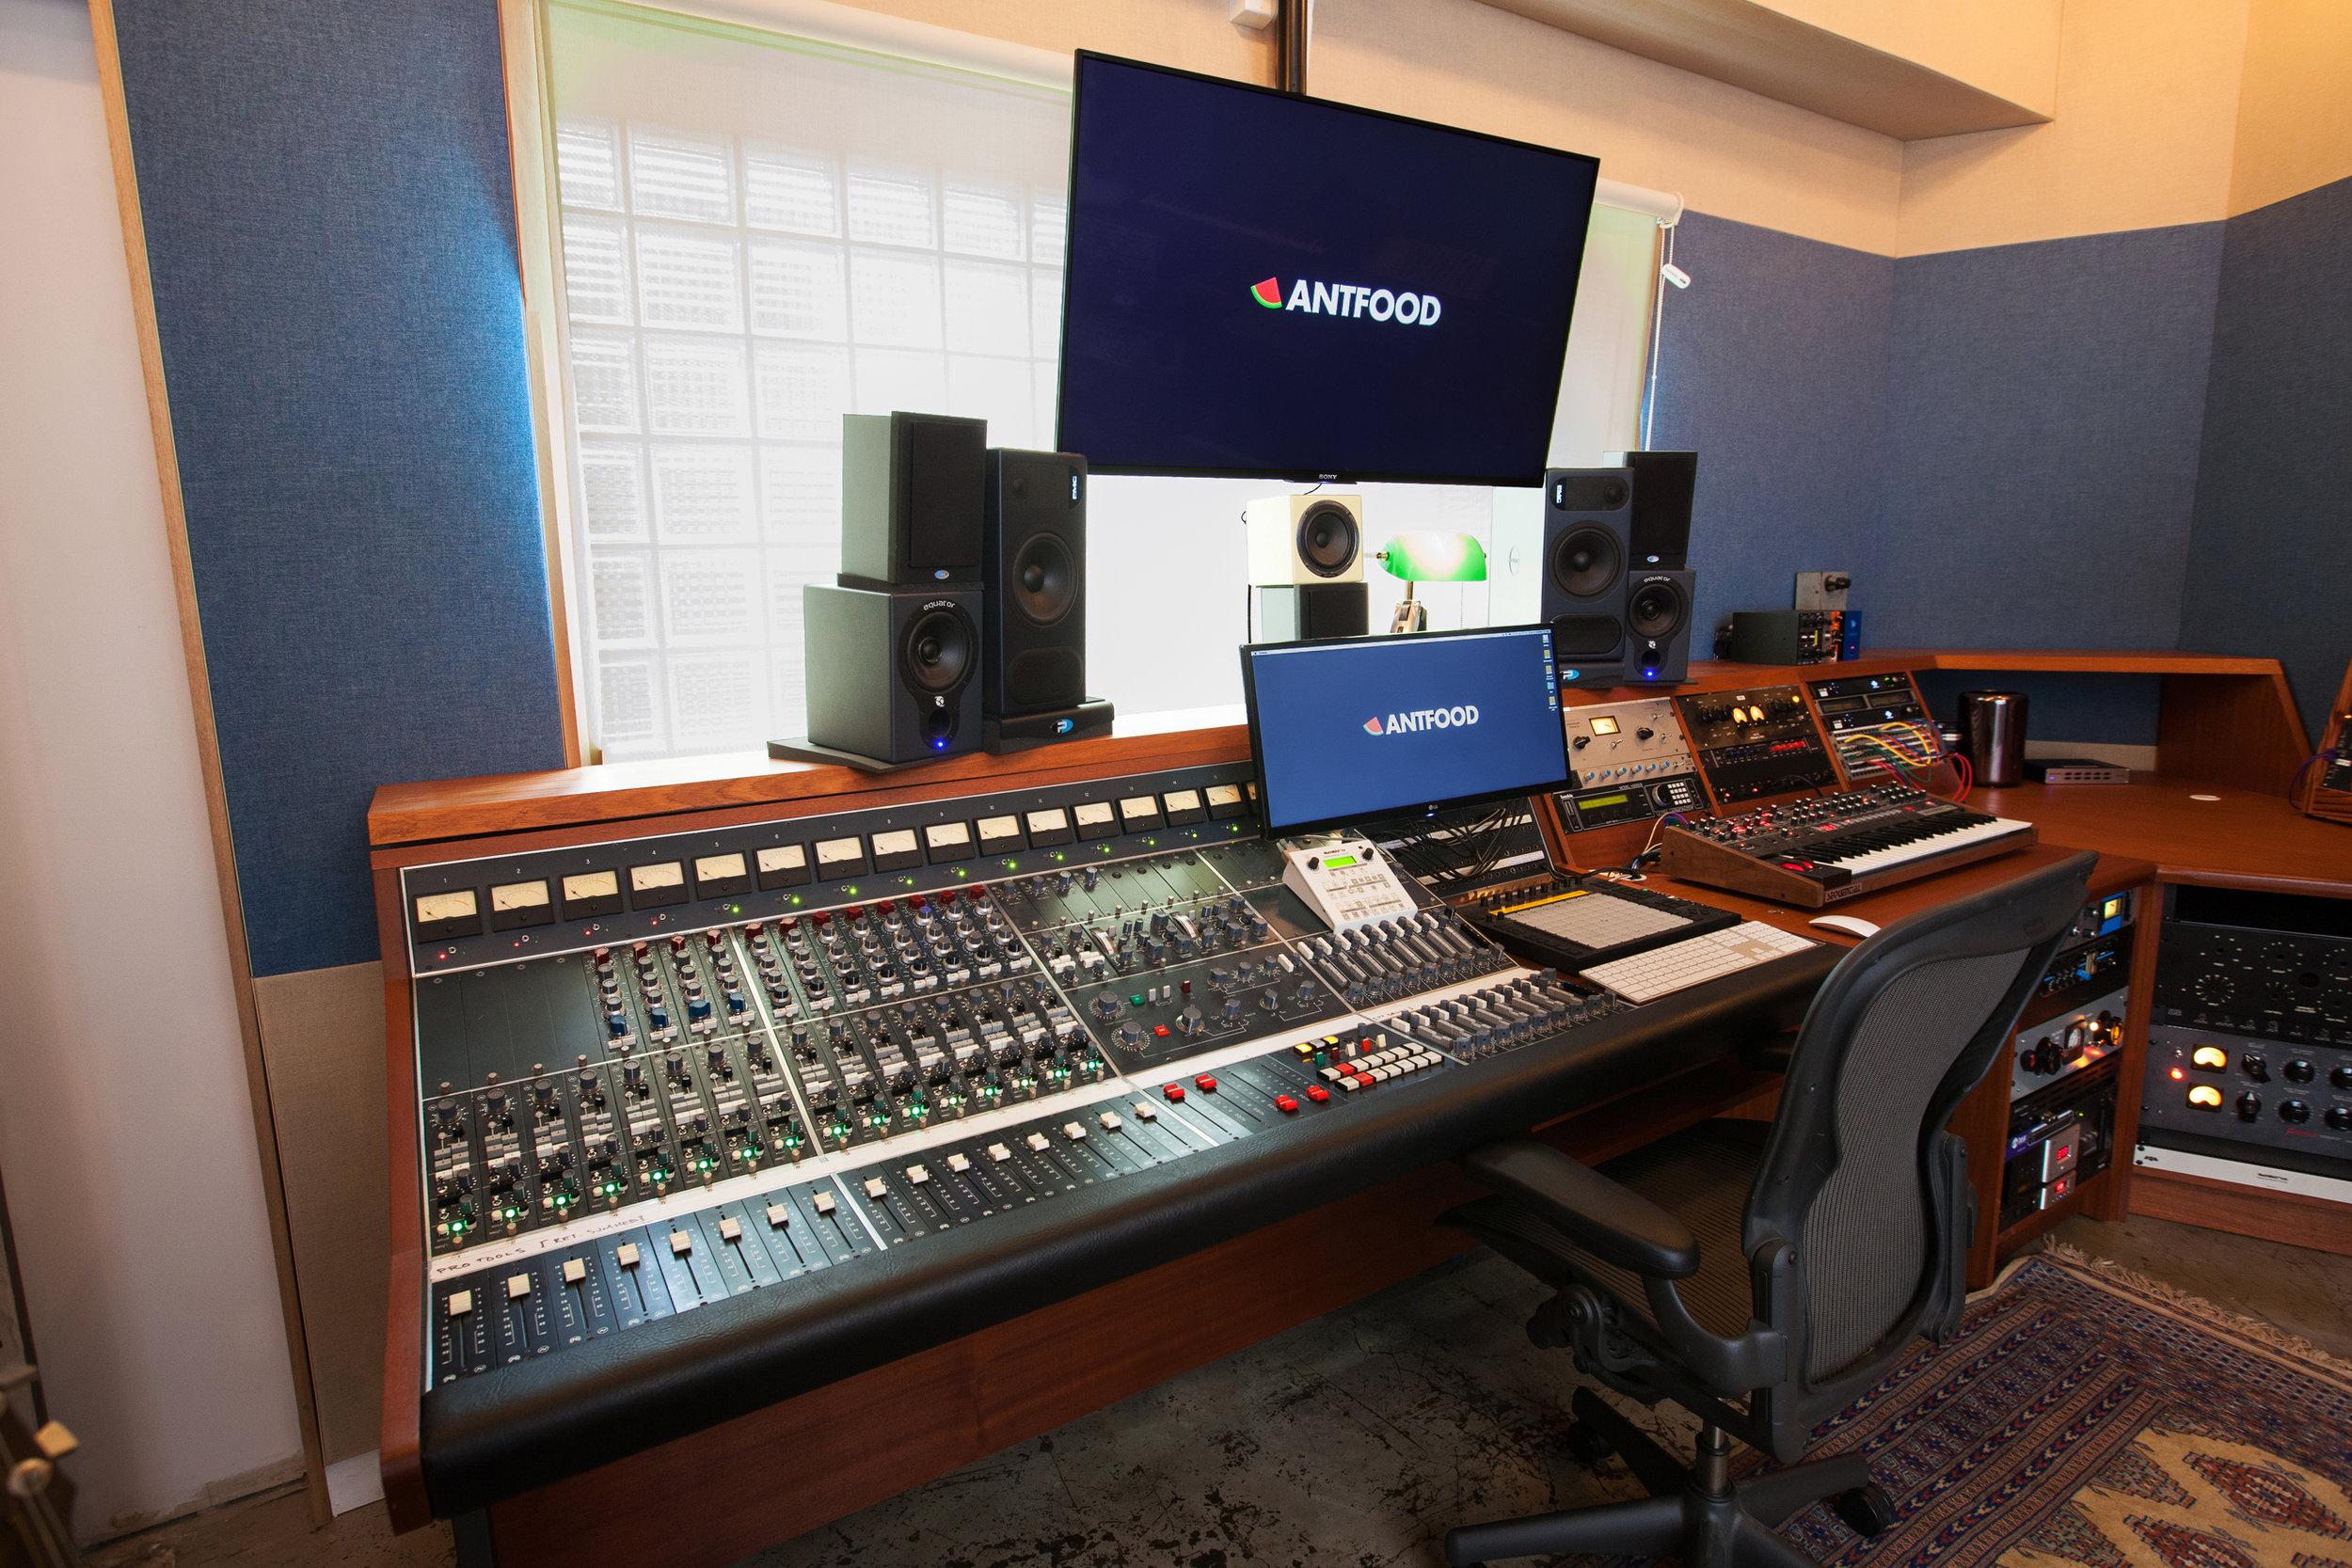 Antfood recording studio3.jpg